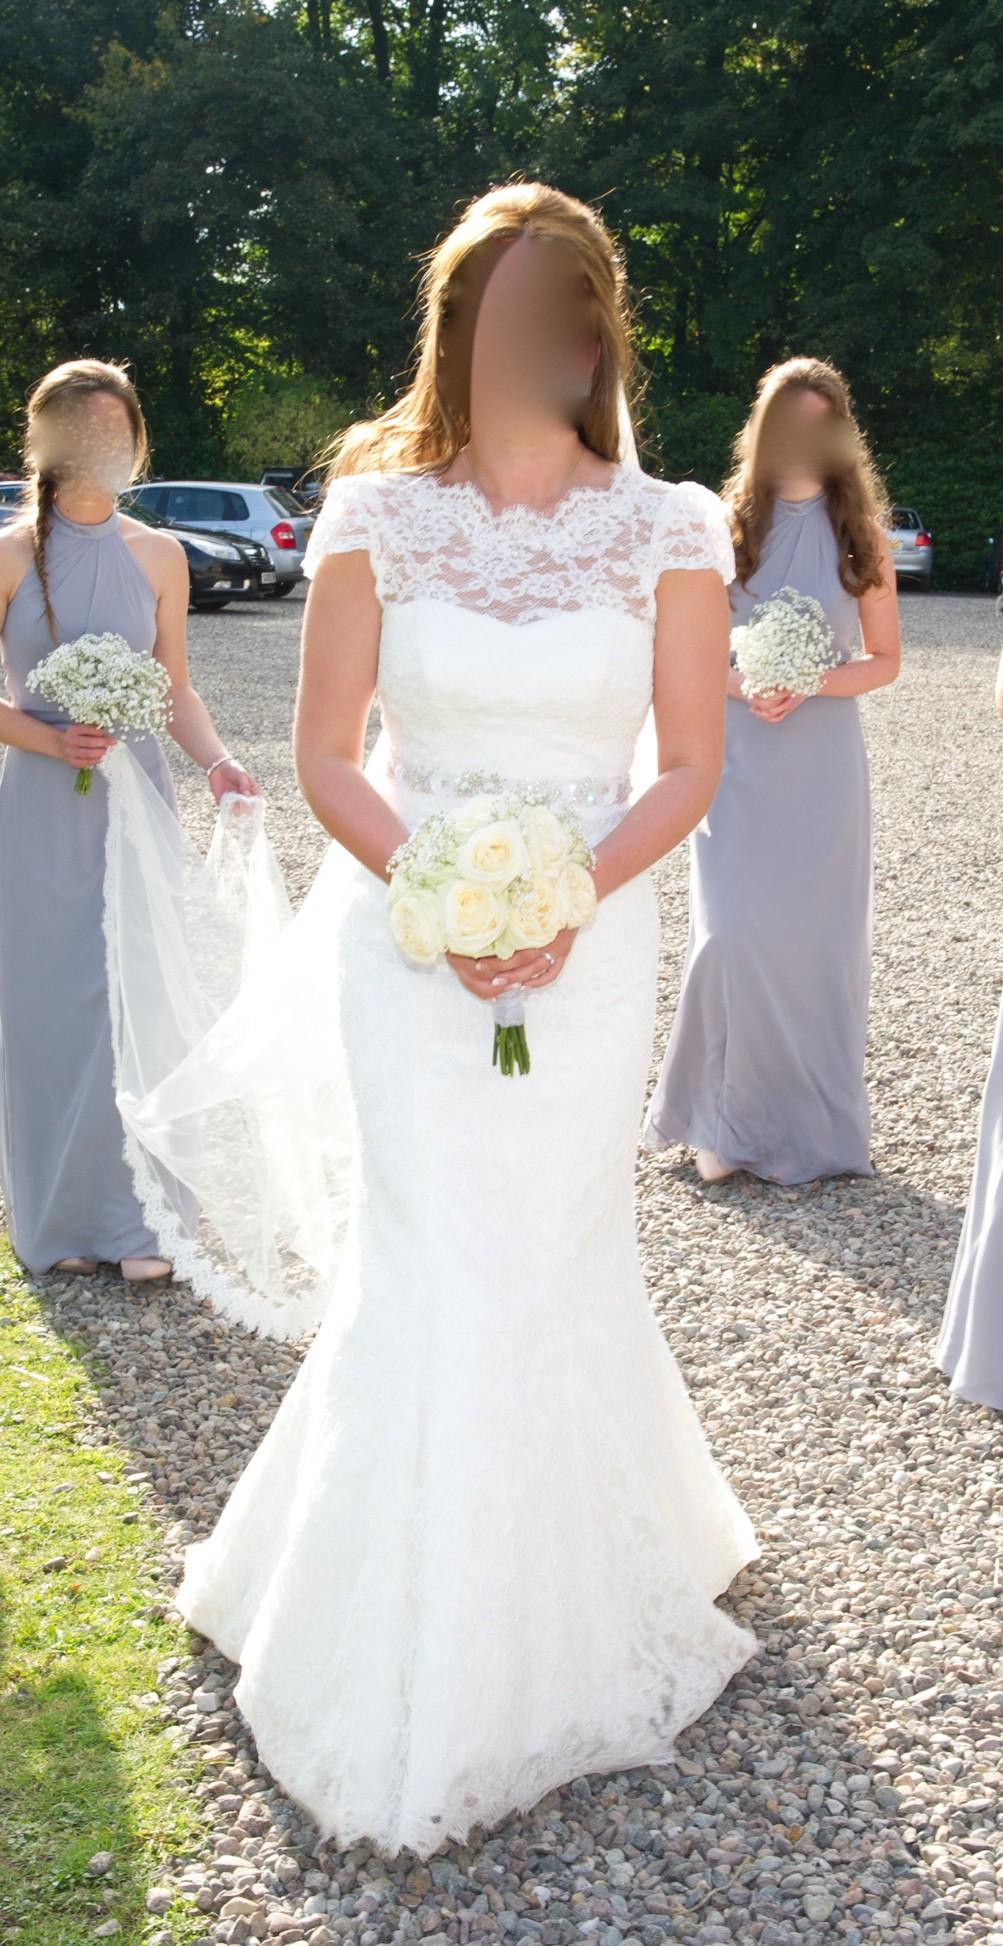 Stewart Parvin Crazy Love Used Wedding Dress On Sale 86 Off